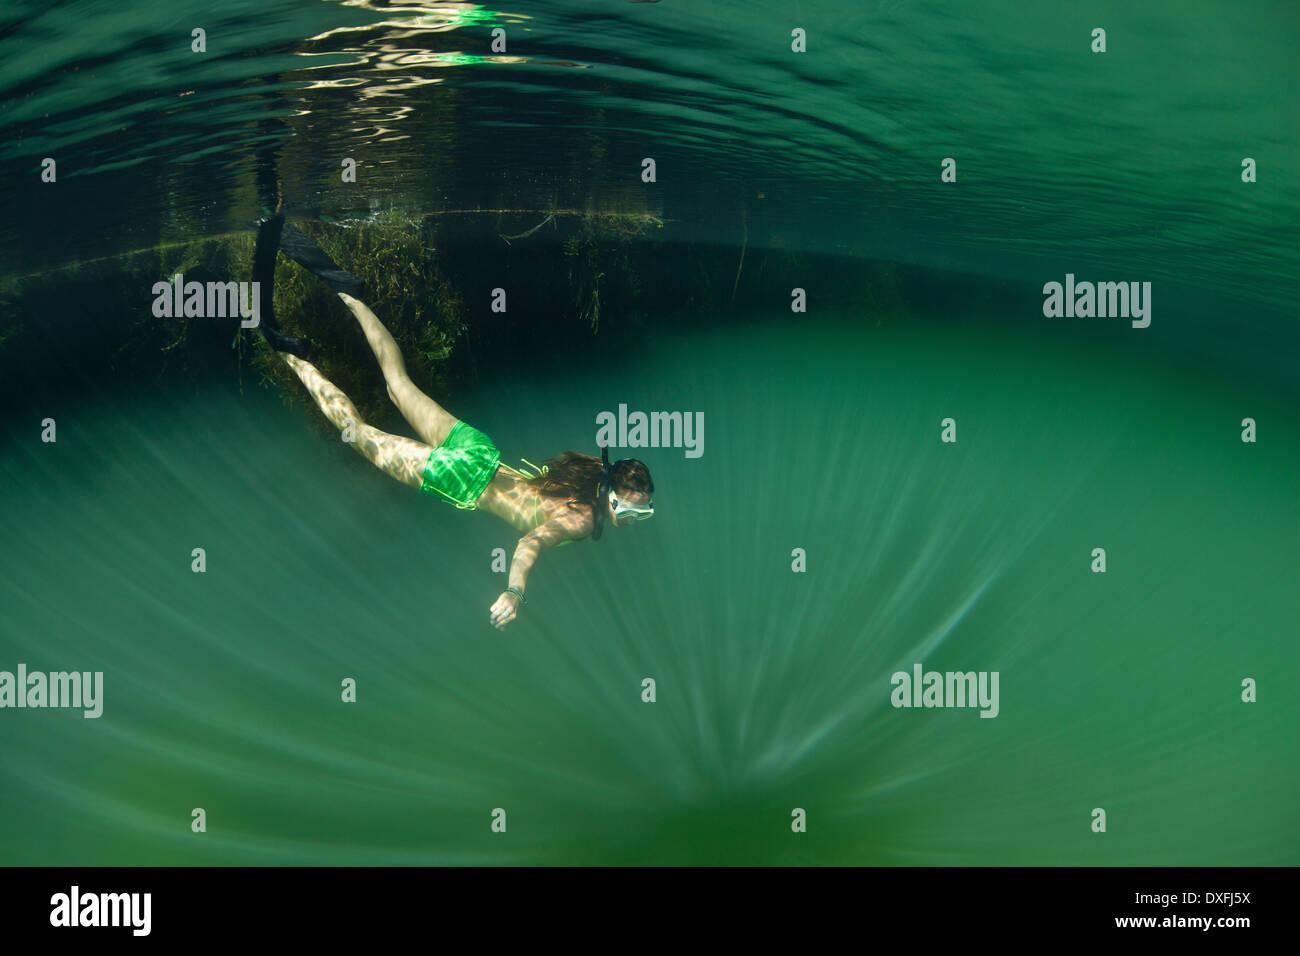 Snorkeling in green Marine Lake, Raja Ampat, West Papua, Indonesia - Stock Image